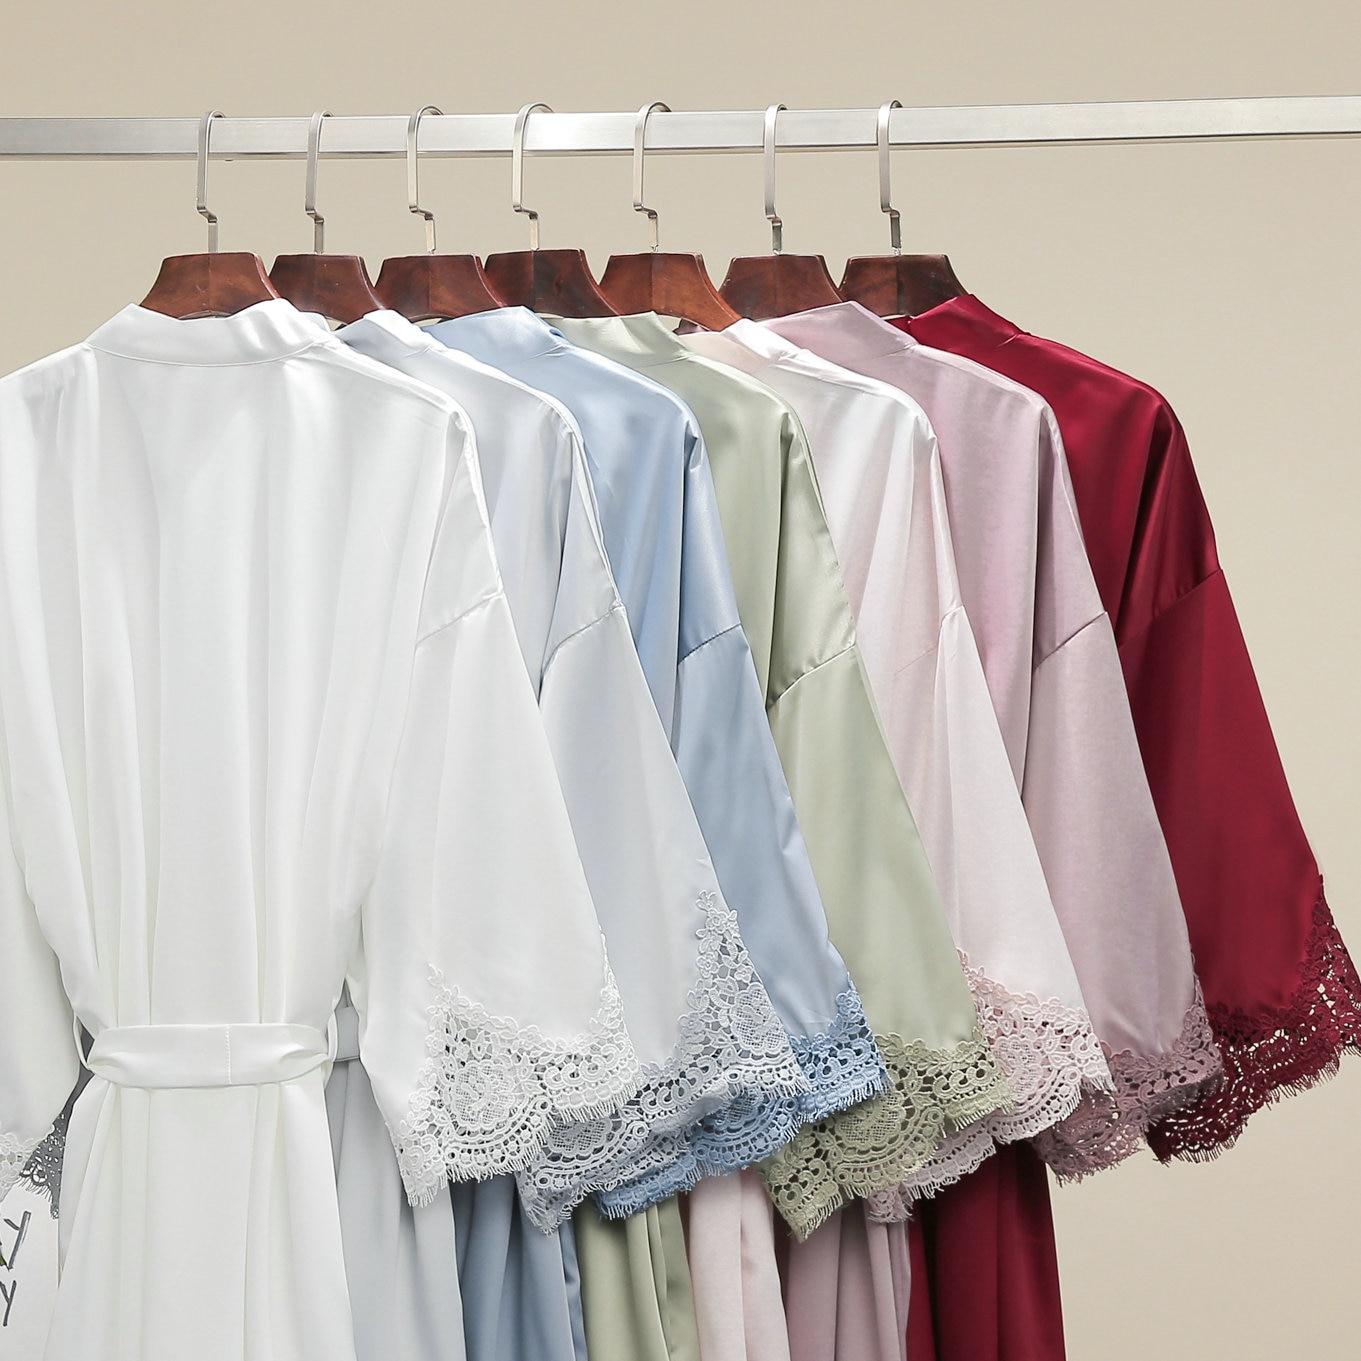 2020 New Women Matt Satin Lace Robe Bridal Wedding Bride Robe Bridesmaid Robe Satin Robes Bathrobe Sleepwear